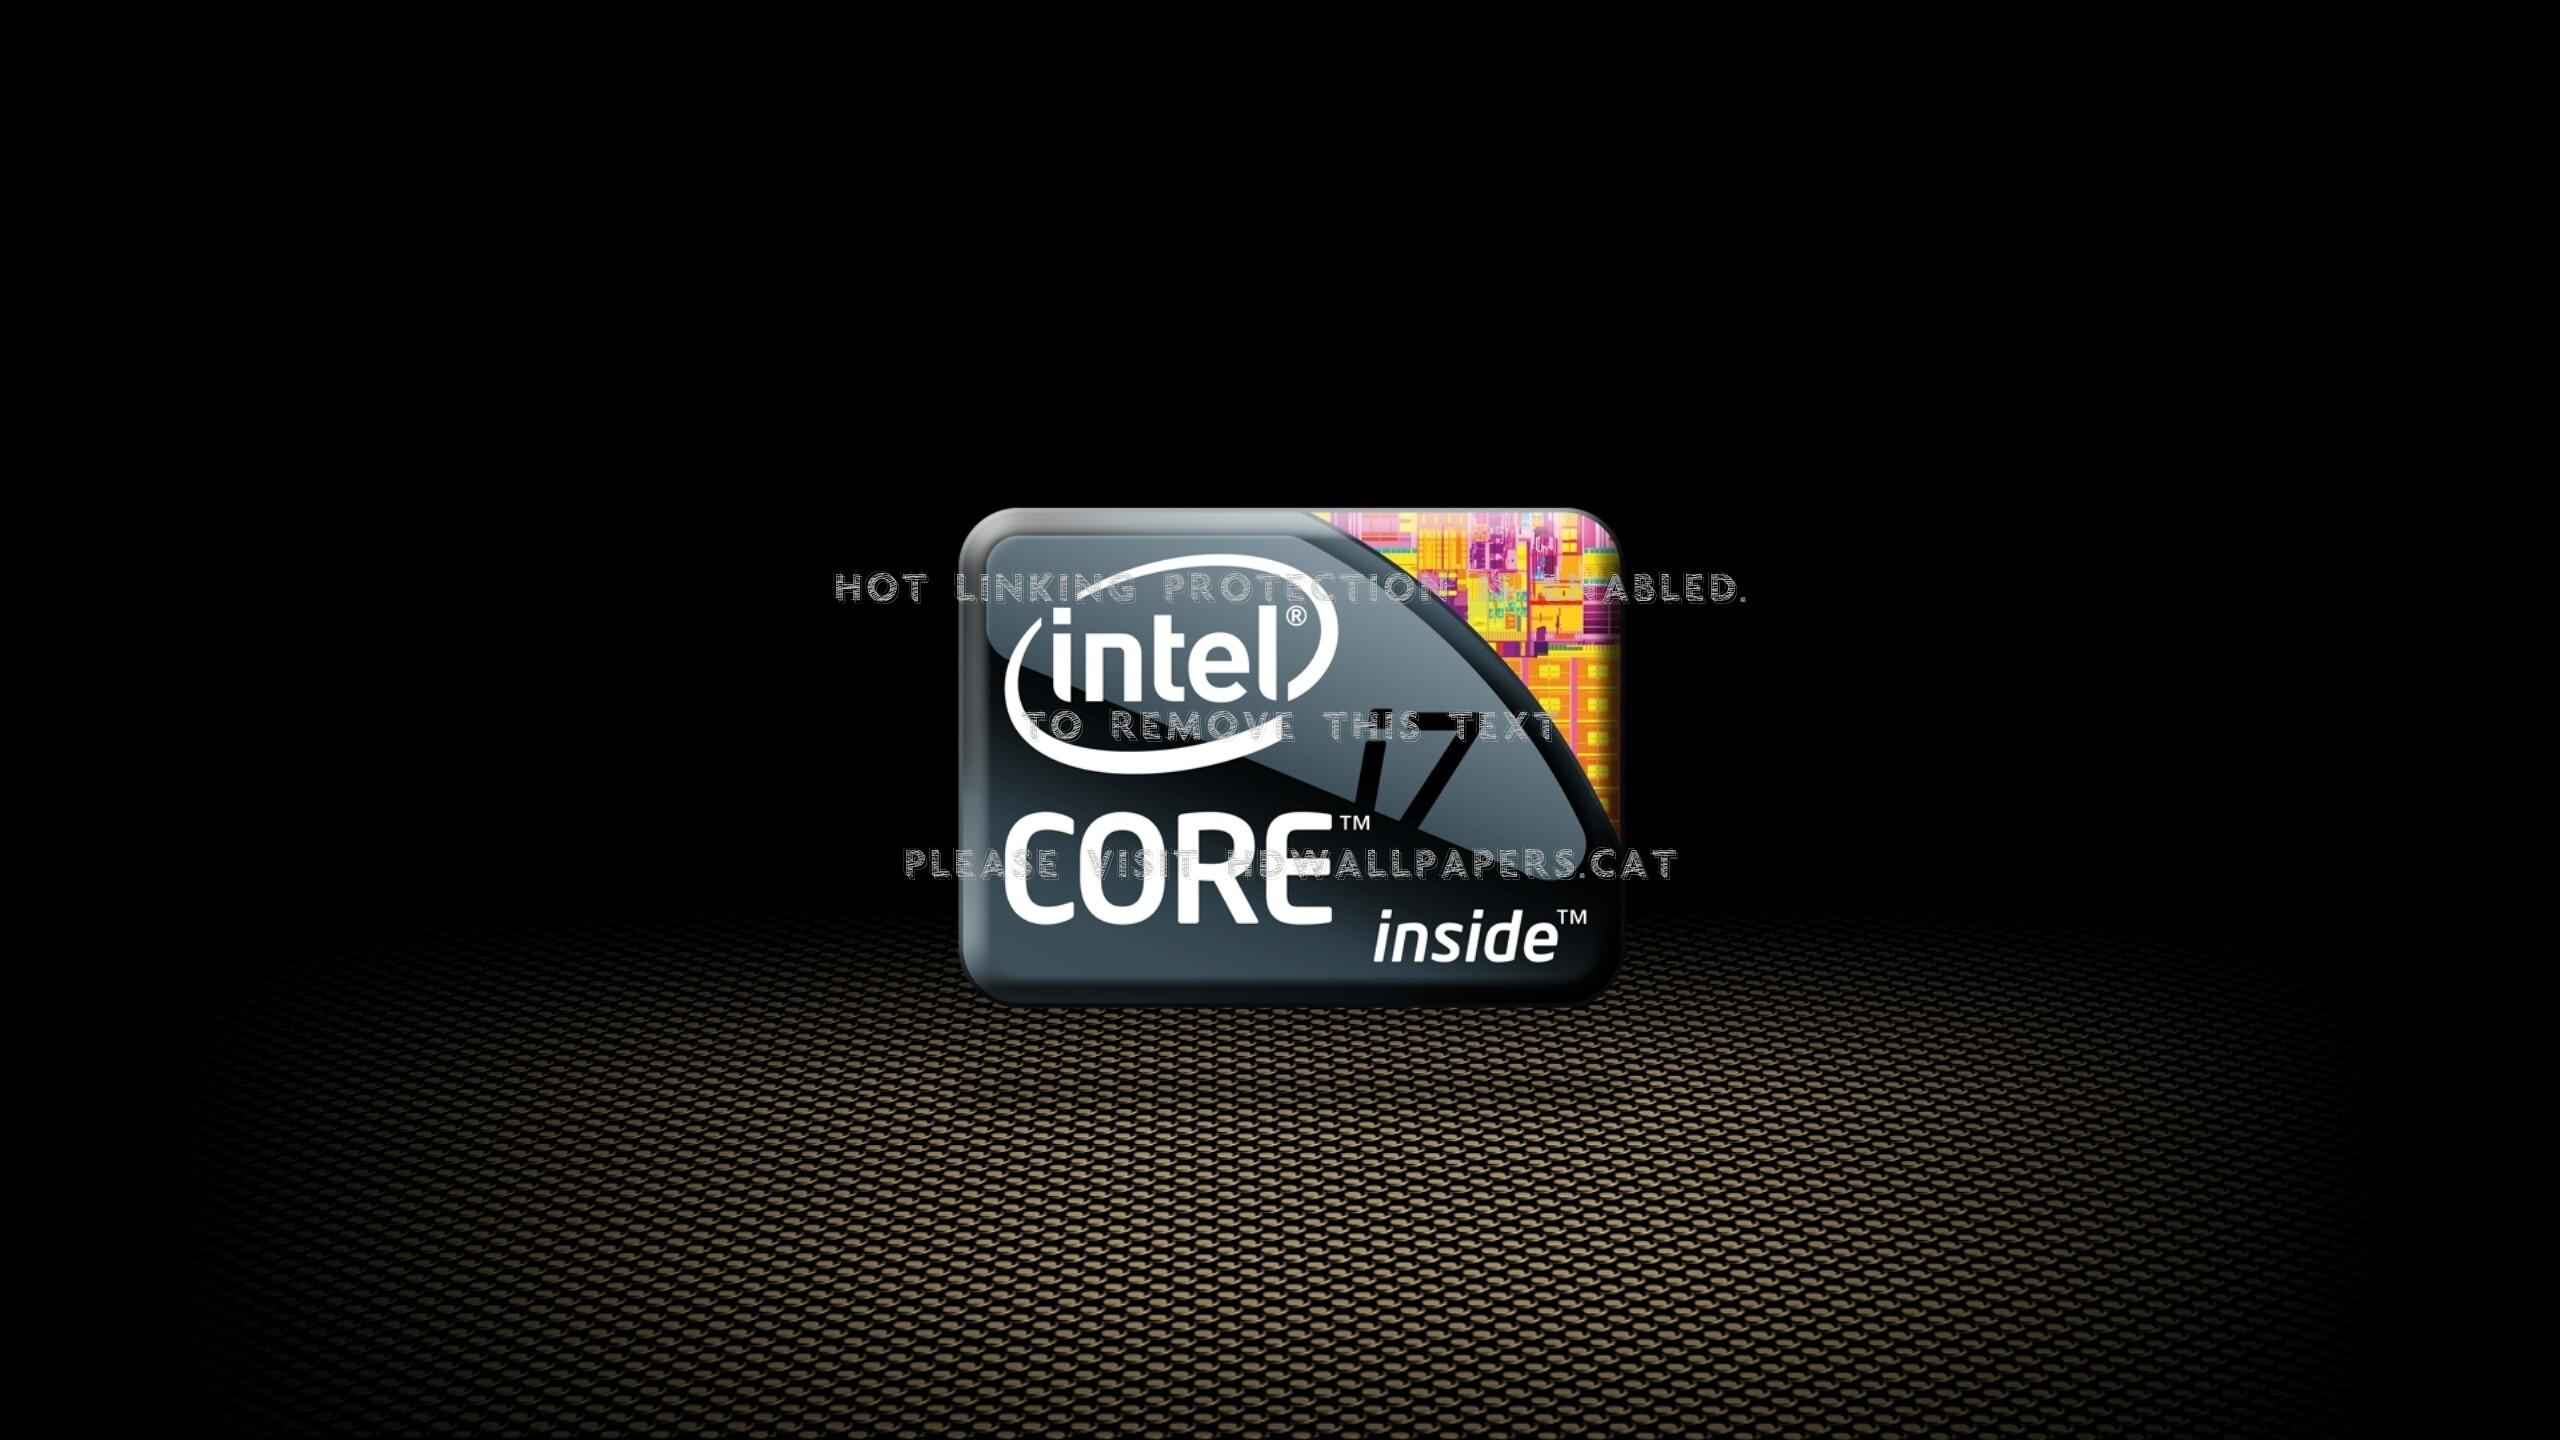 intel core i7 ivy bridge haswell sandy 2560x1440